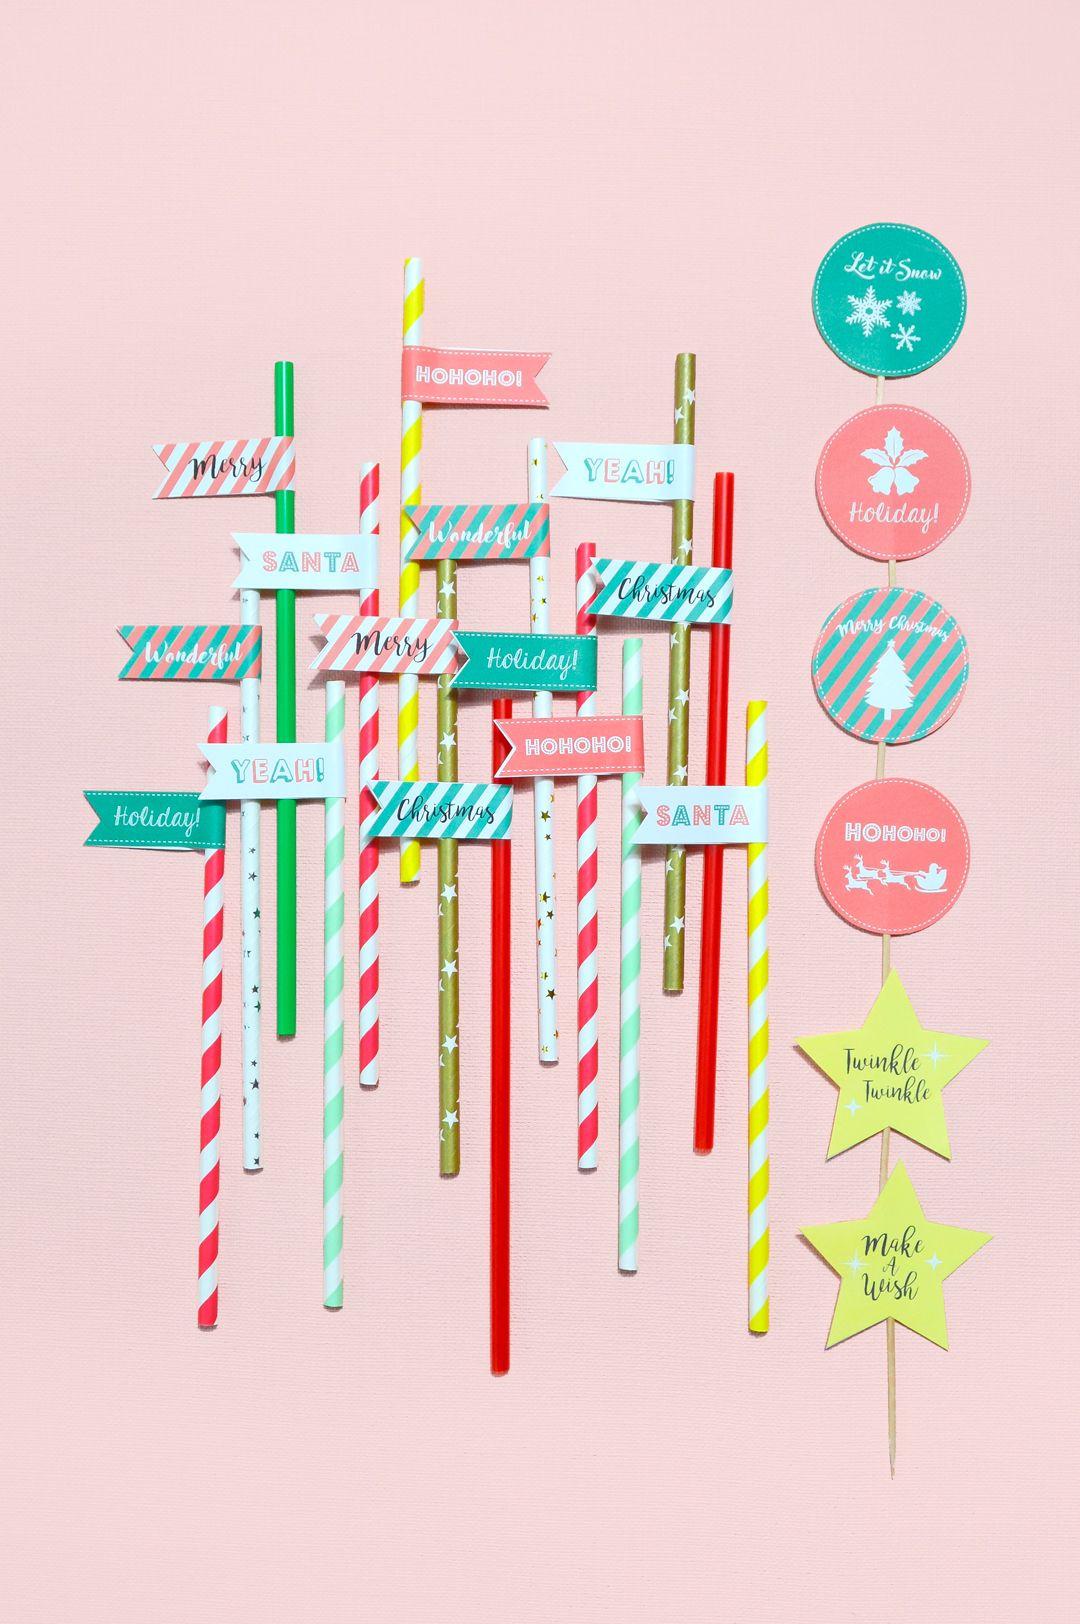 free holiday printable 2017 クリスマスパーティに 簡単デコストロー